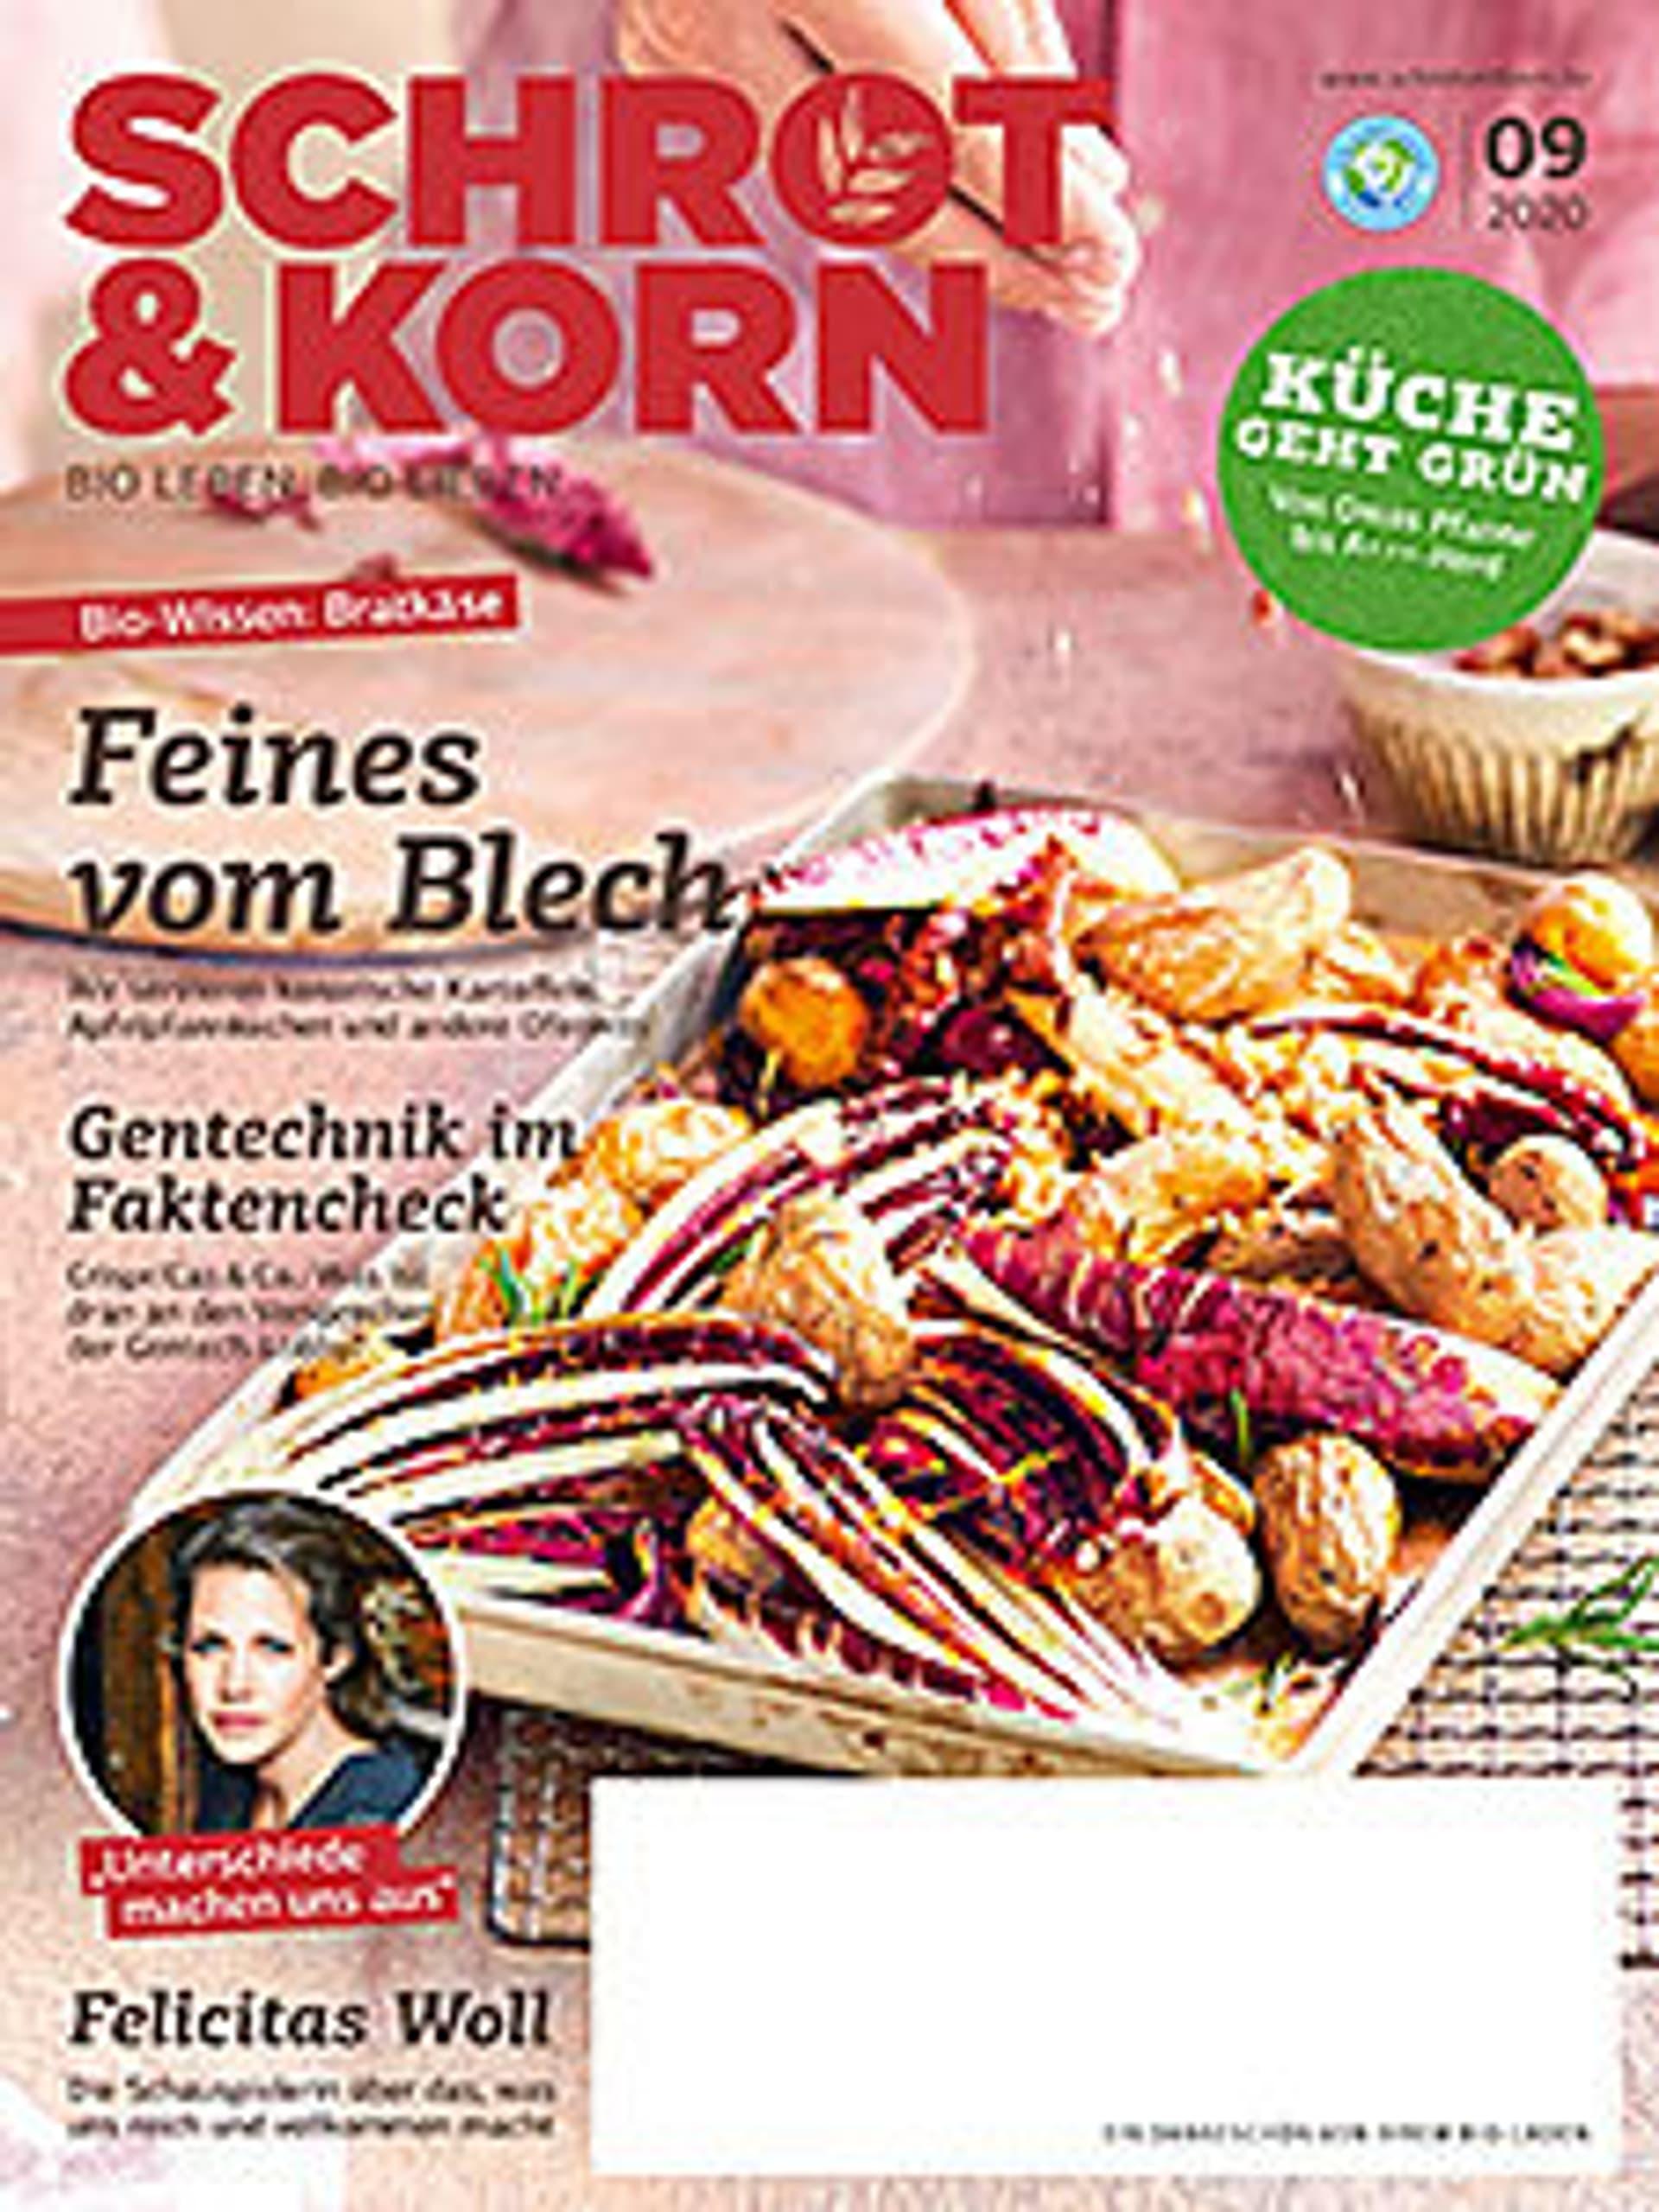 Schrot&Korn 09/2020